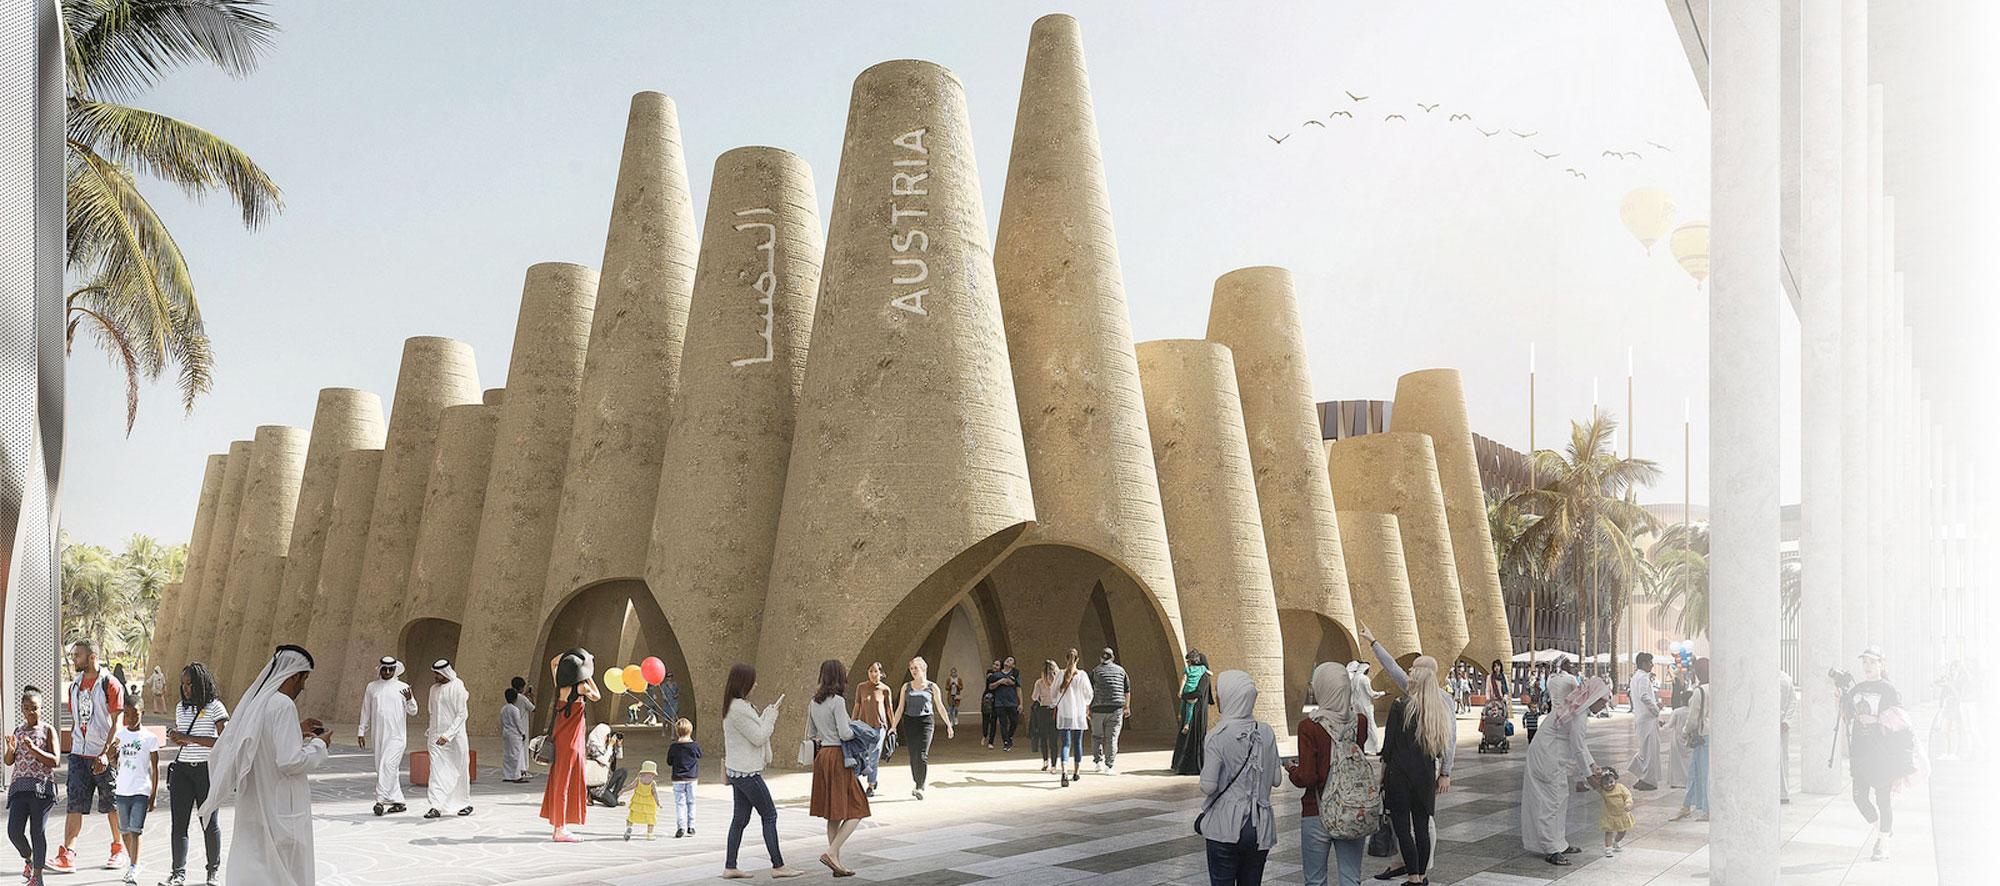 Austrian Pavilion for Expo 2020 Dubai by querkraft architekten. Image © querkraft architekten - bagienski